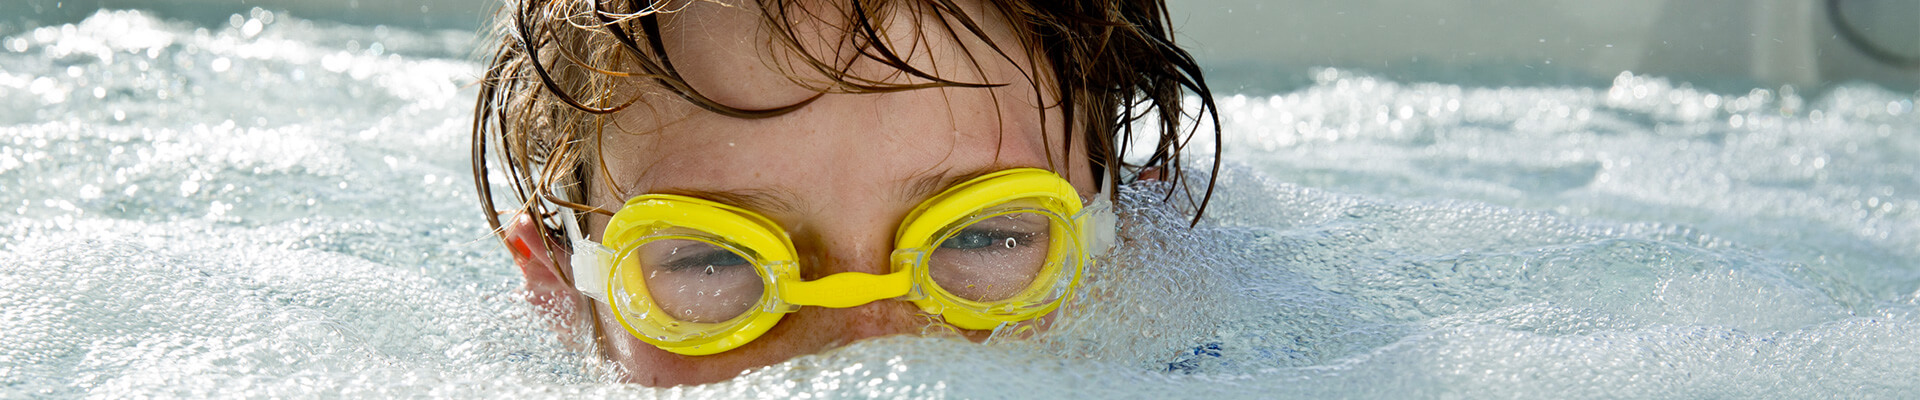 3 Benefits from Regular Lap Pool Use That May Surprise You, Swim Spas Oconomowoc